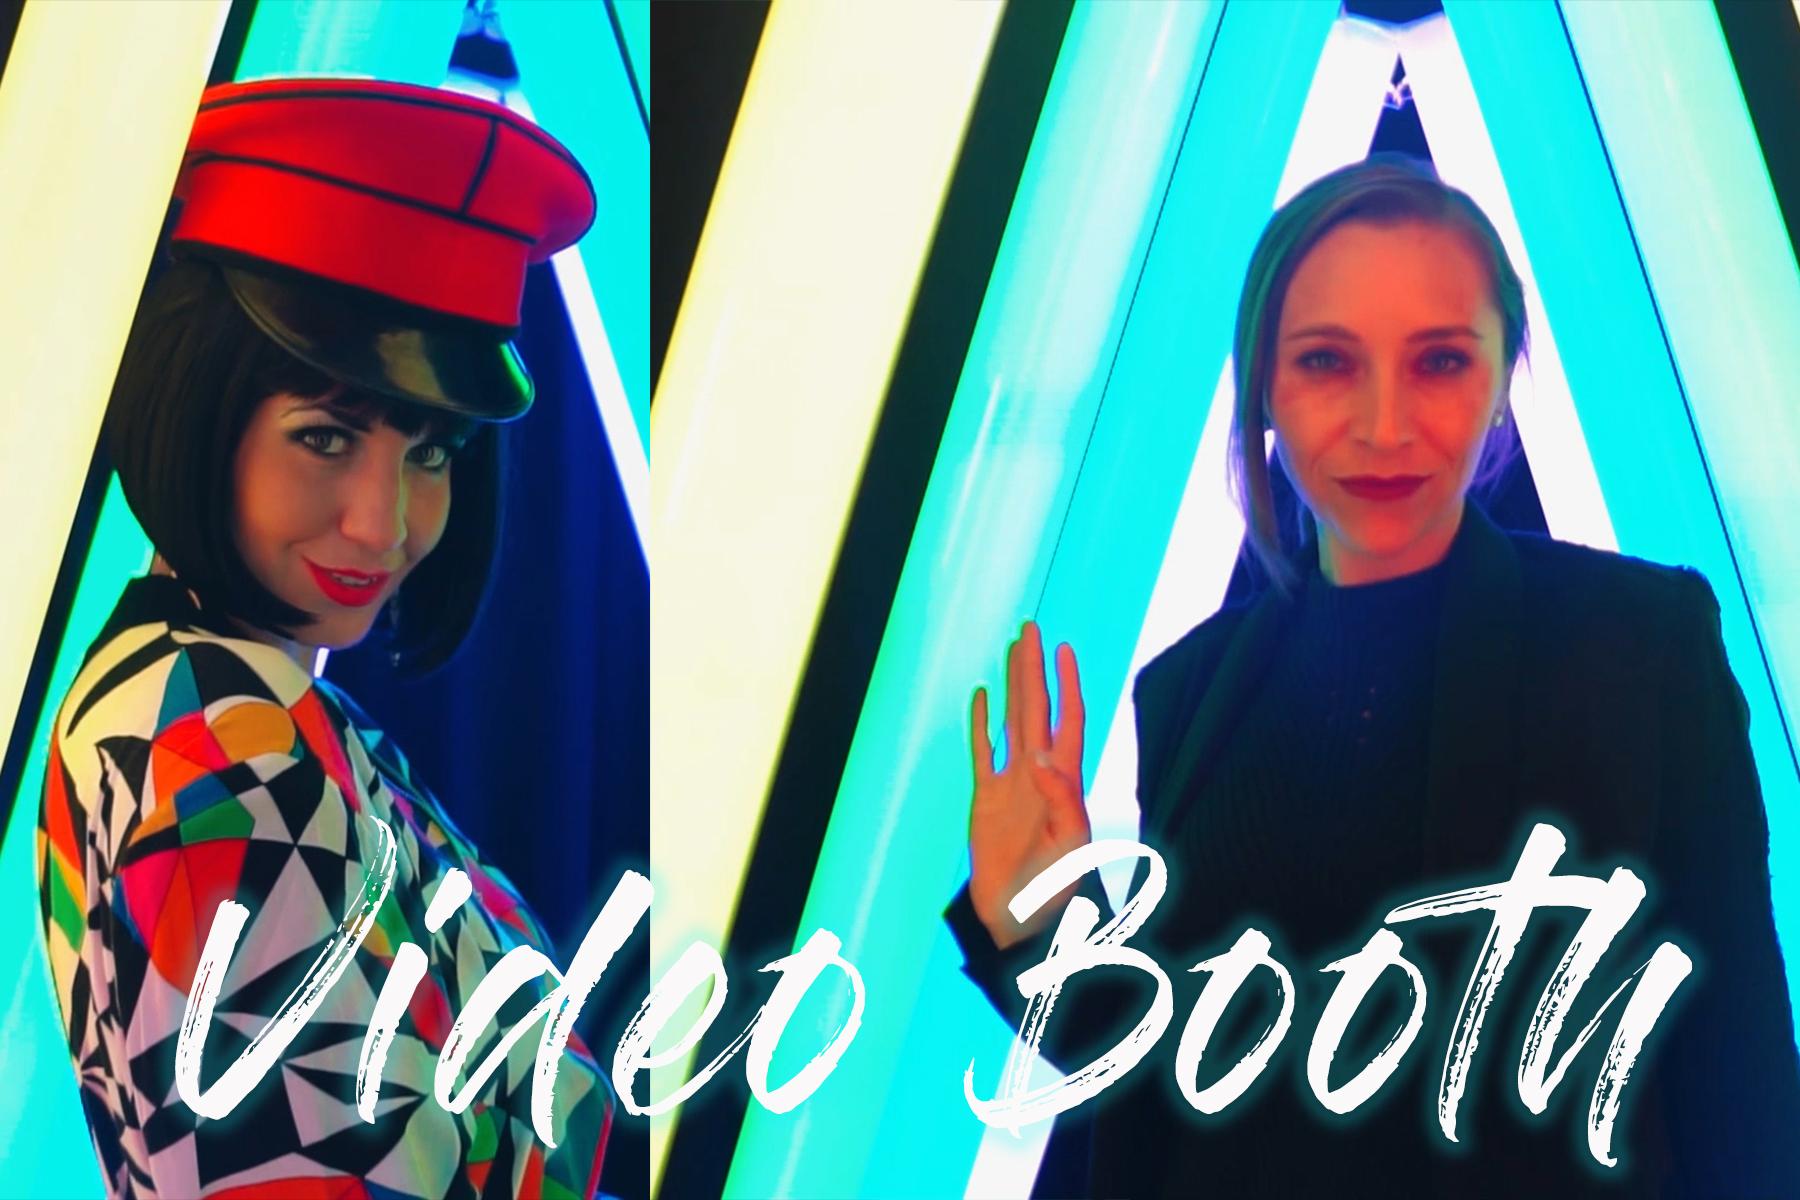 Met Gala Video Booth Style